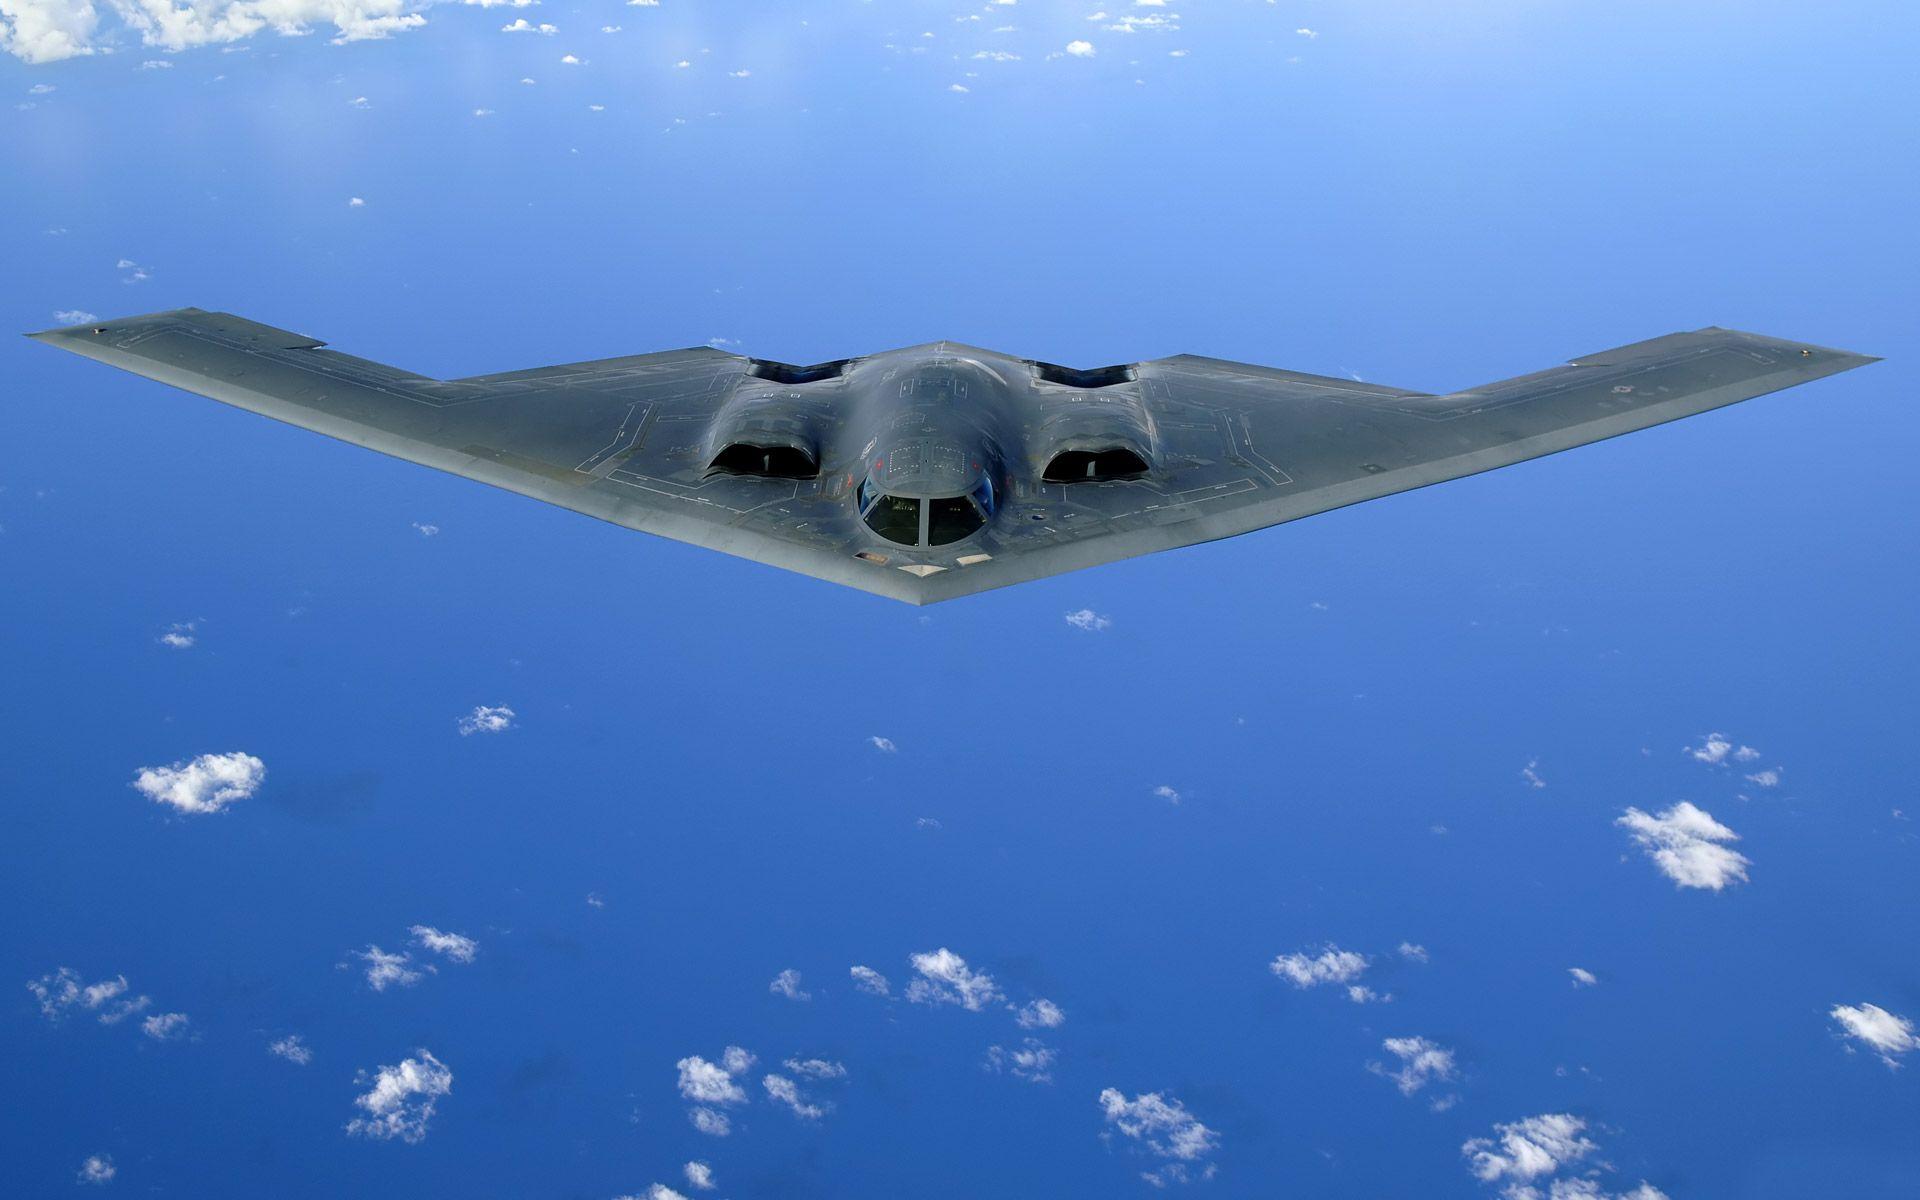 b1 bomber wallpaper - Google Search | Model Reference | Pinterest ...